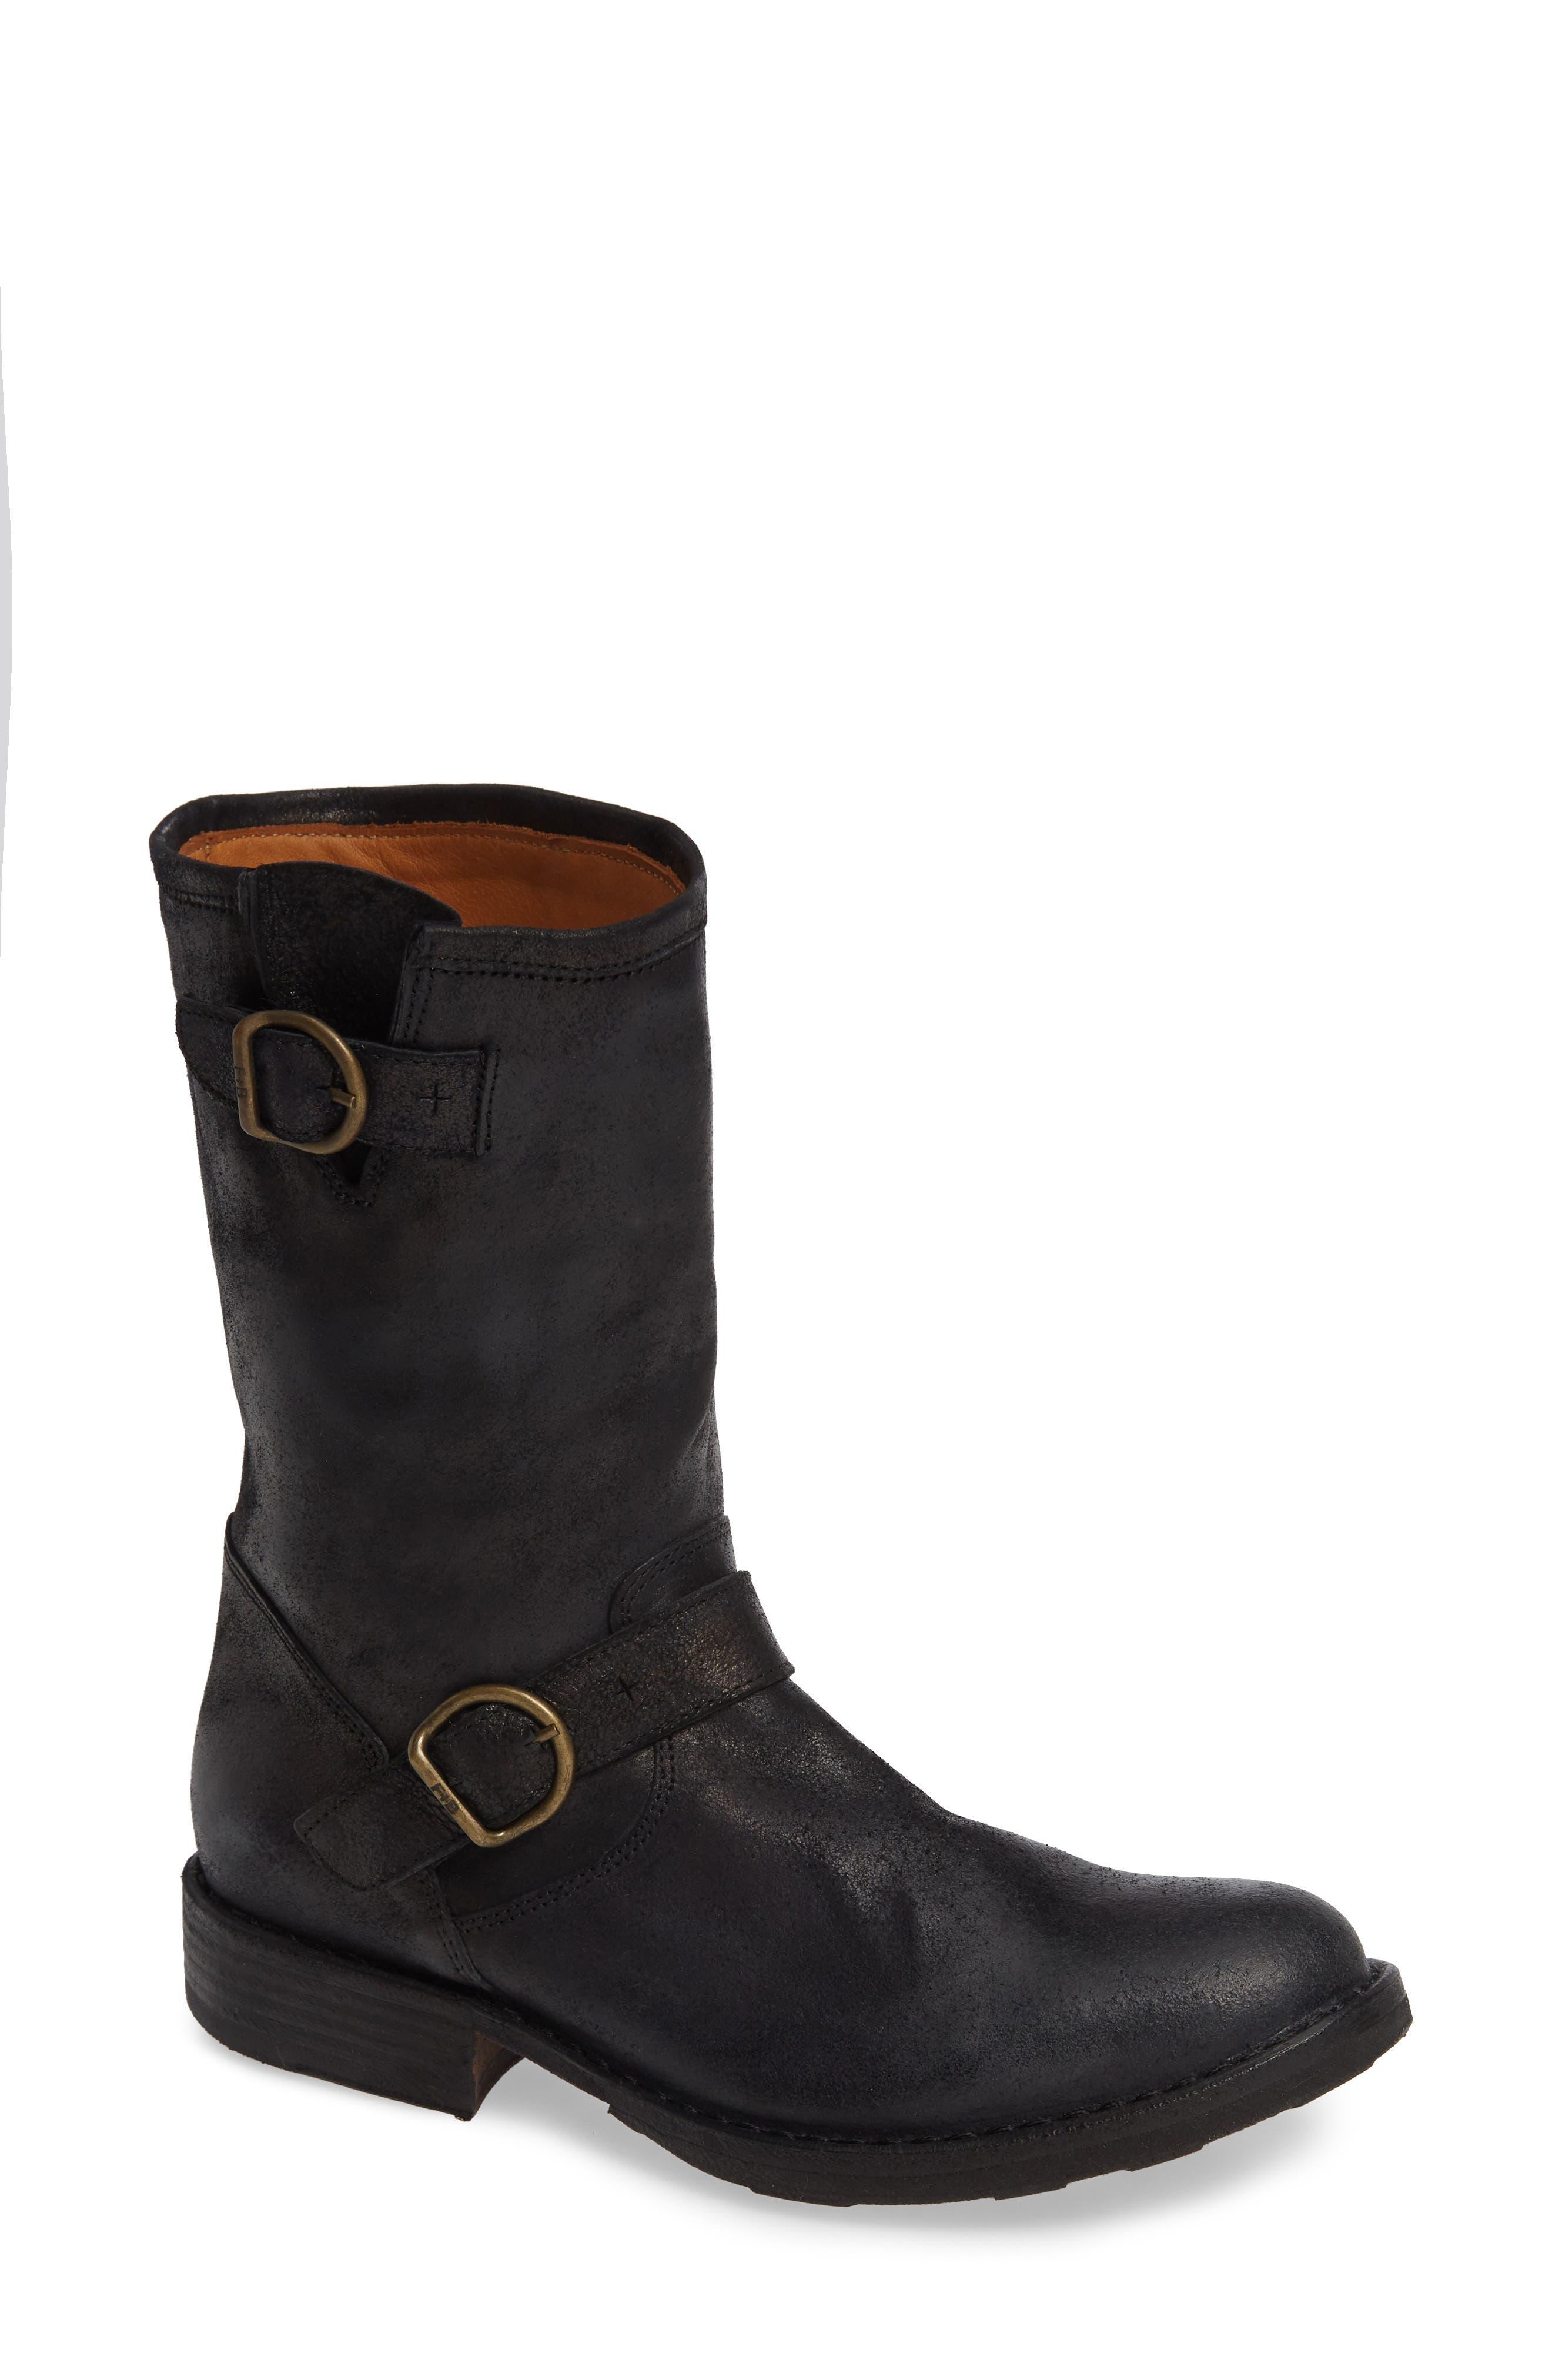 FIORENTINI + BAKER Edles Boot in Black Leather